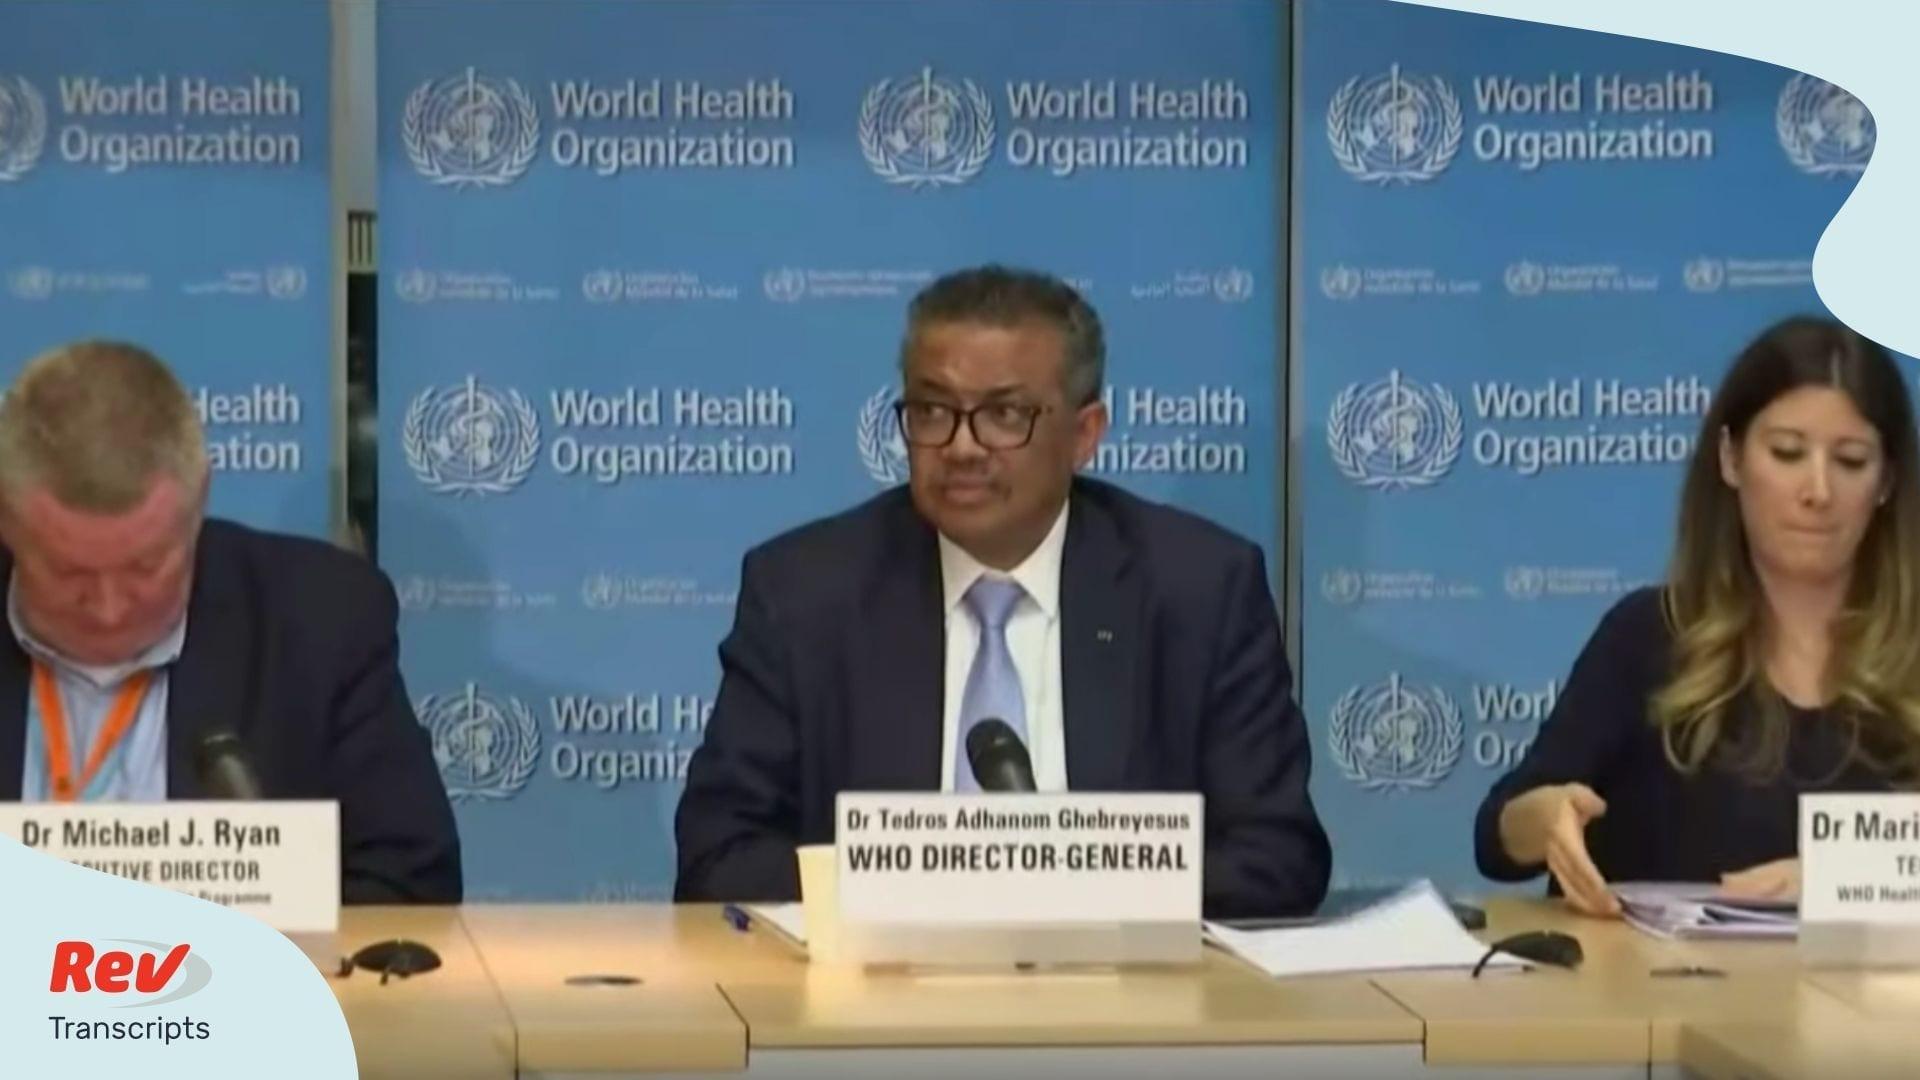 World Health Organization March 2 Update Transcript